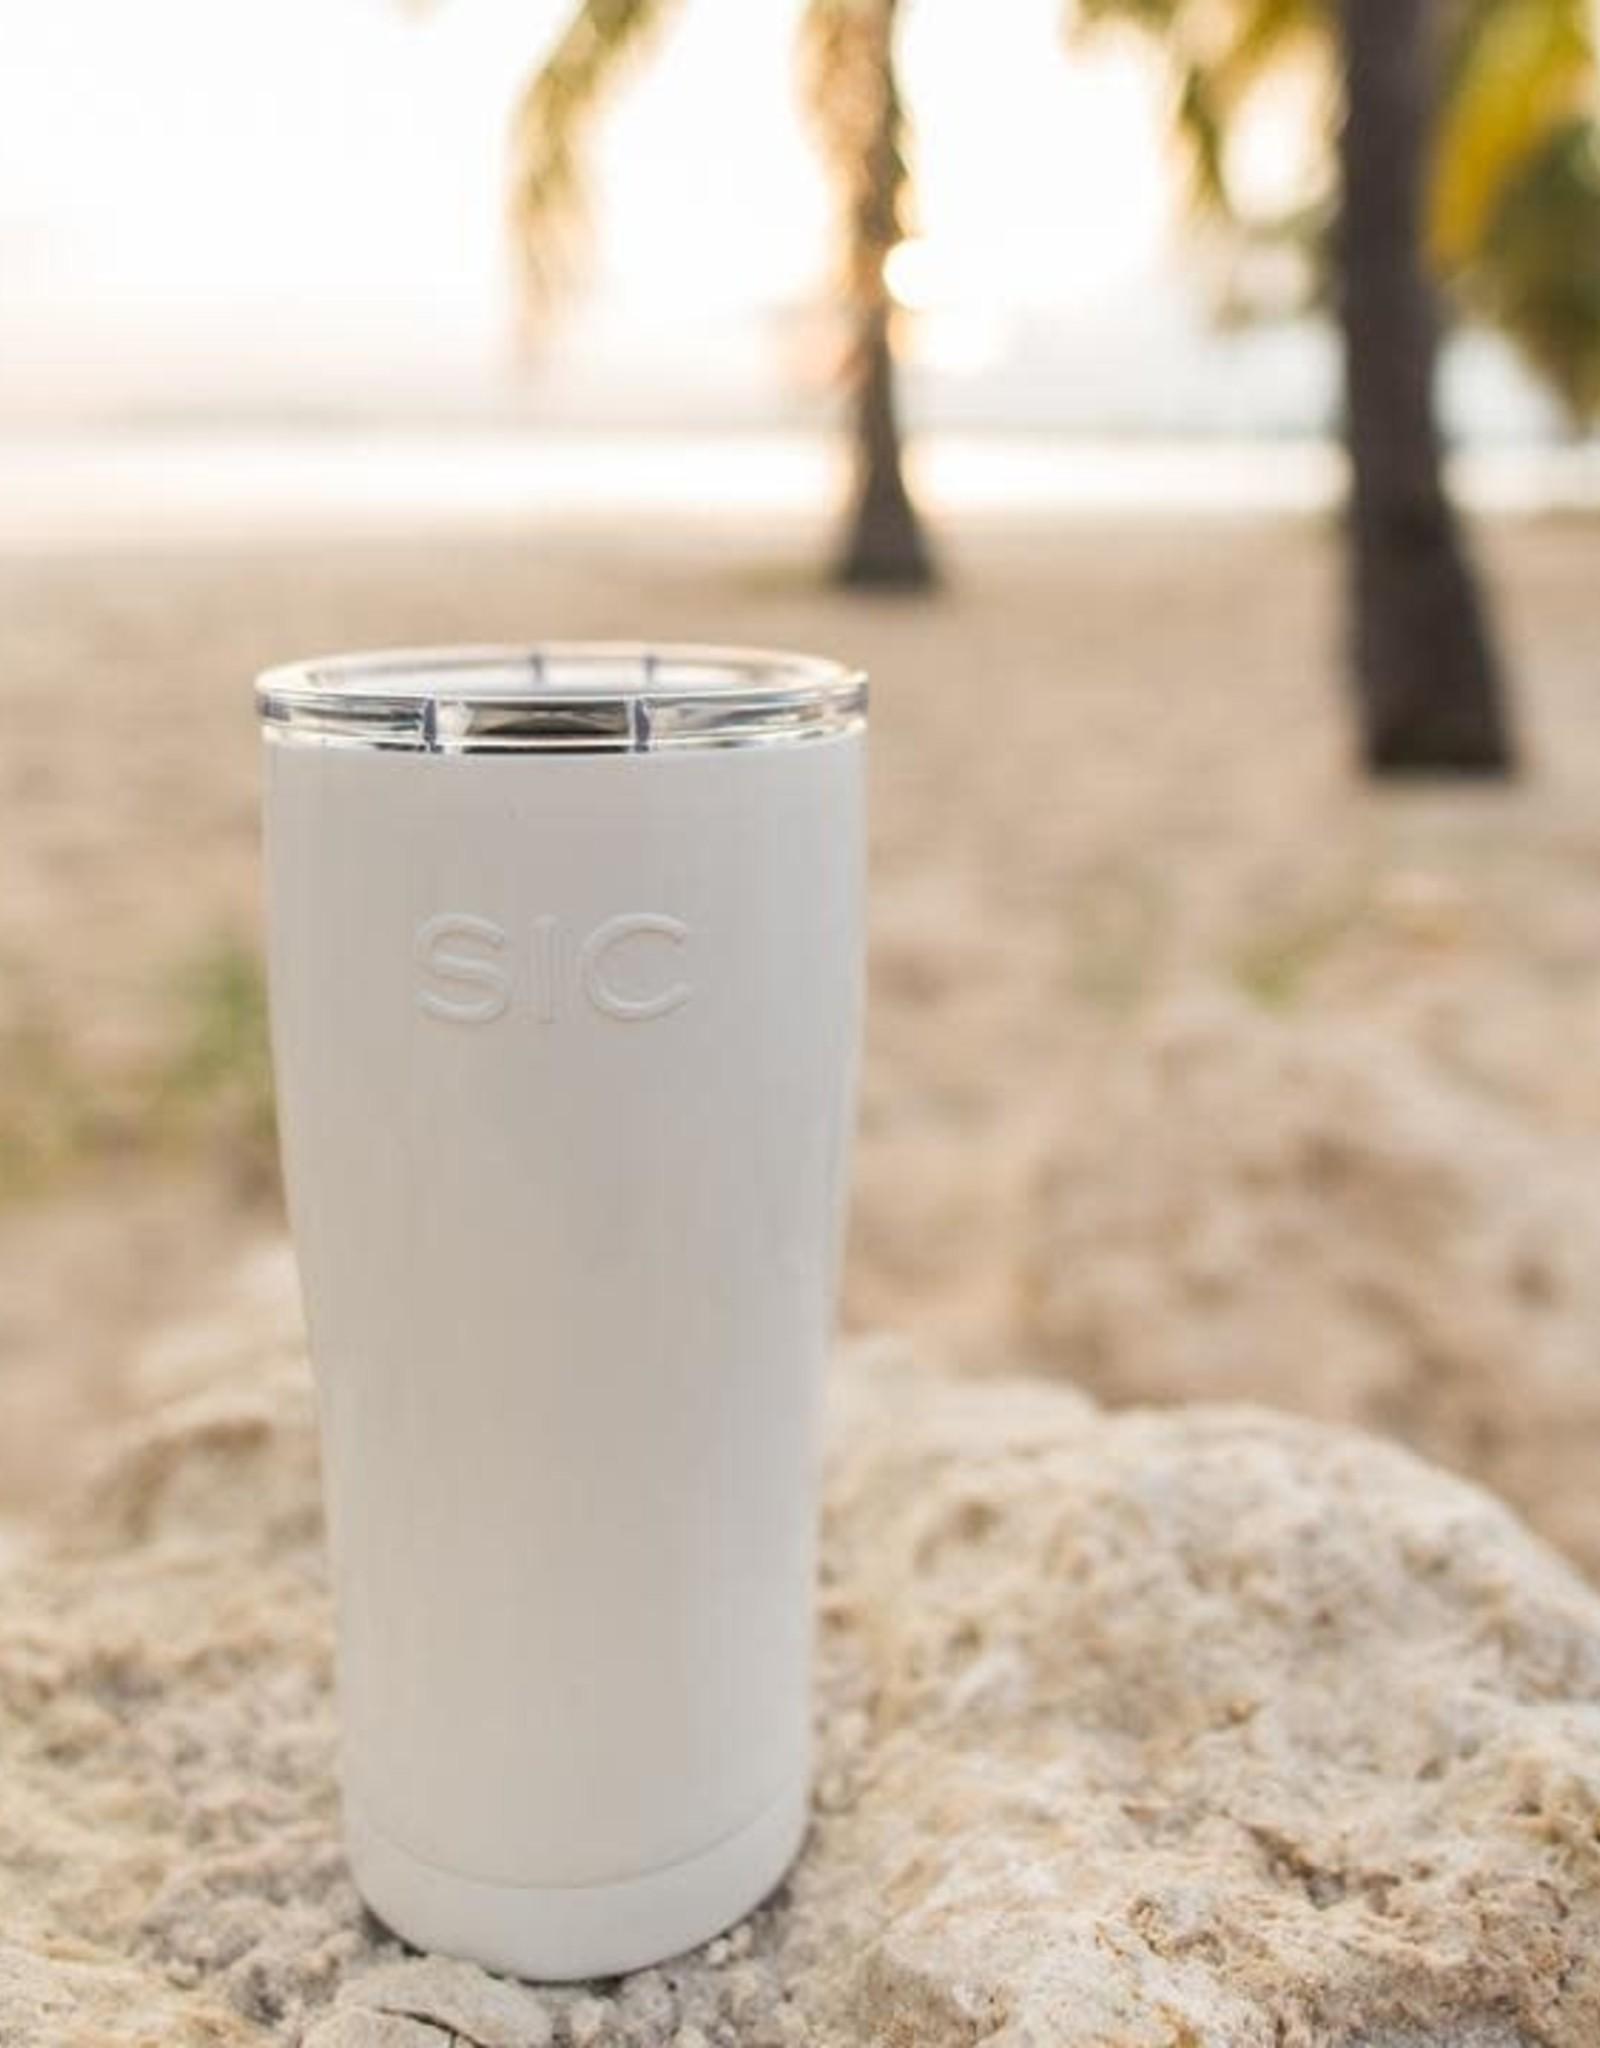 SIC 20 oz Gloss Ice White Stainless Steel Tumbler